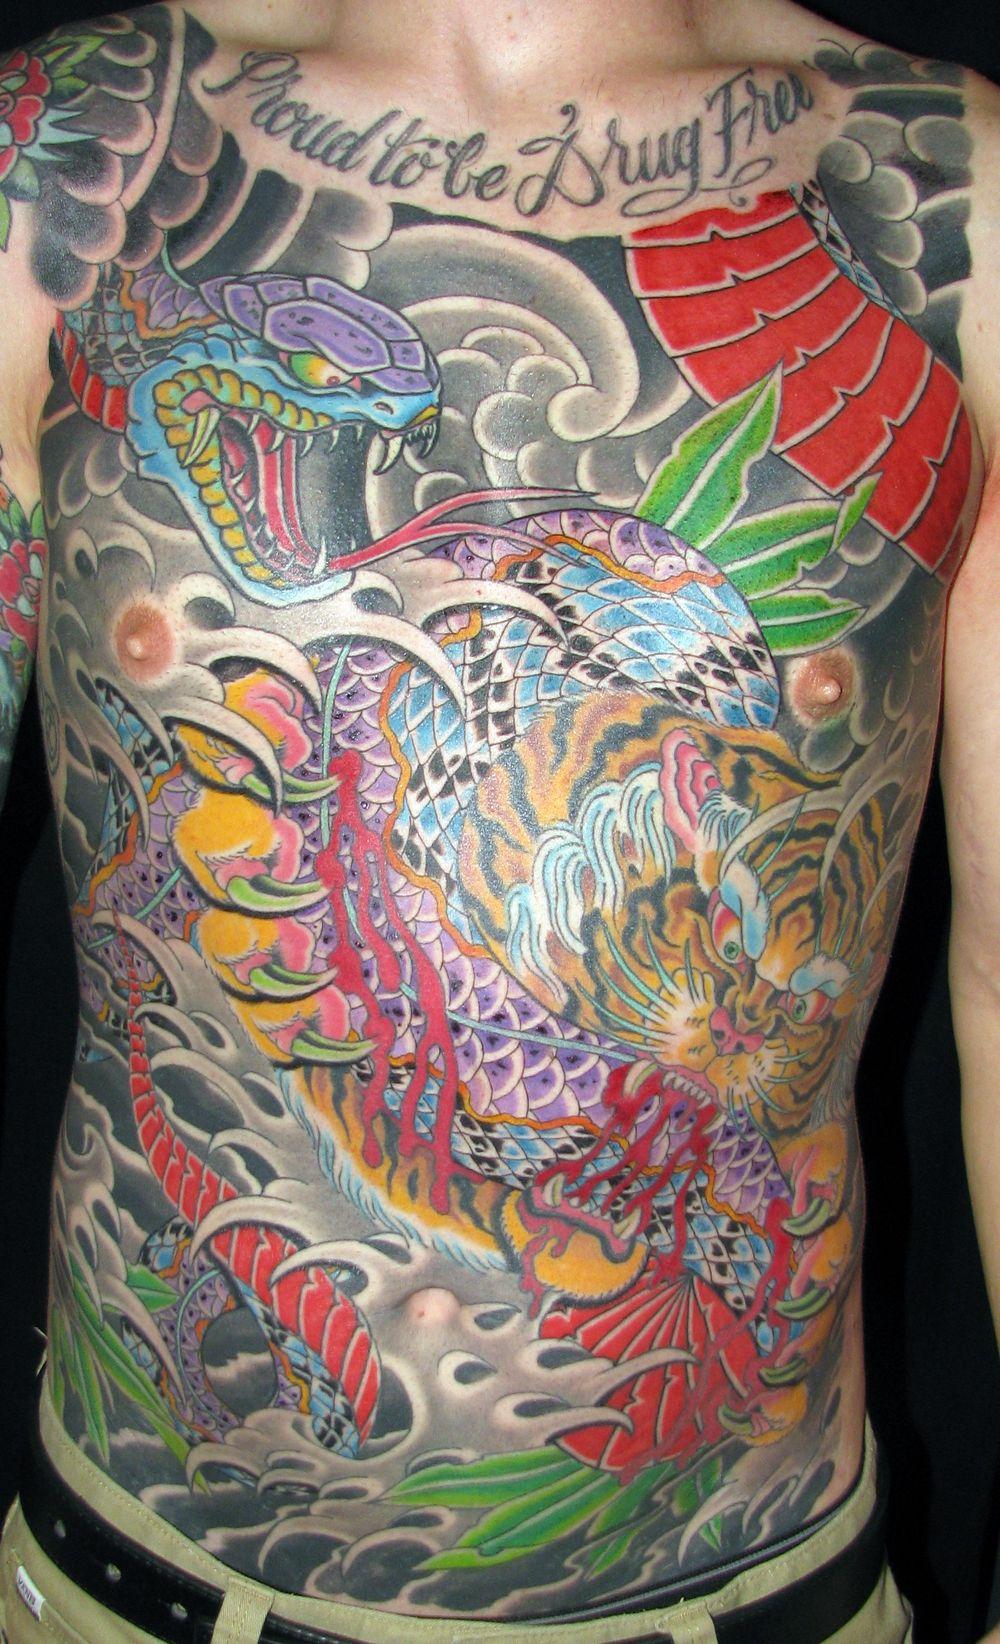 Tattoos By Jay Cavna Immaculate Tattoo (Mesa, AZ) Sanctity Tattoo (Tucson, AZ)